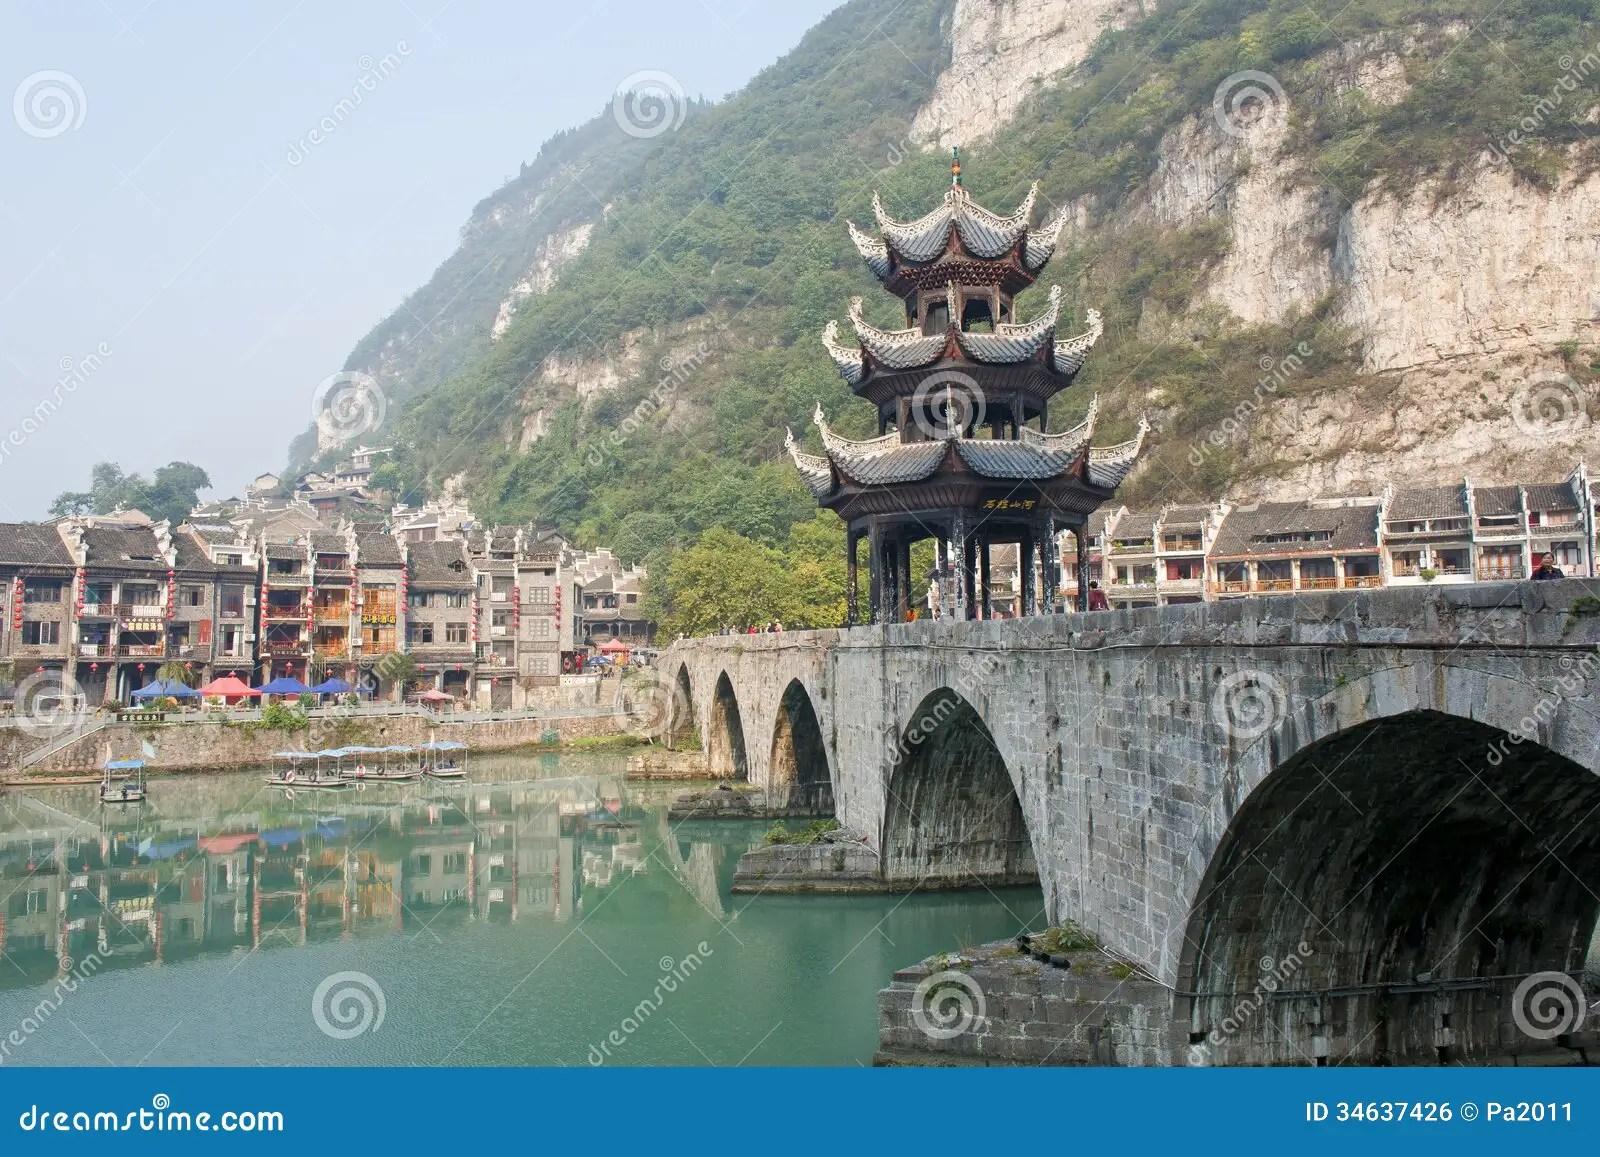 Free 3d Scenic Wallpaper Zhenyuan Ancient Town In Guizhou China Editorial Photo